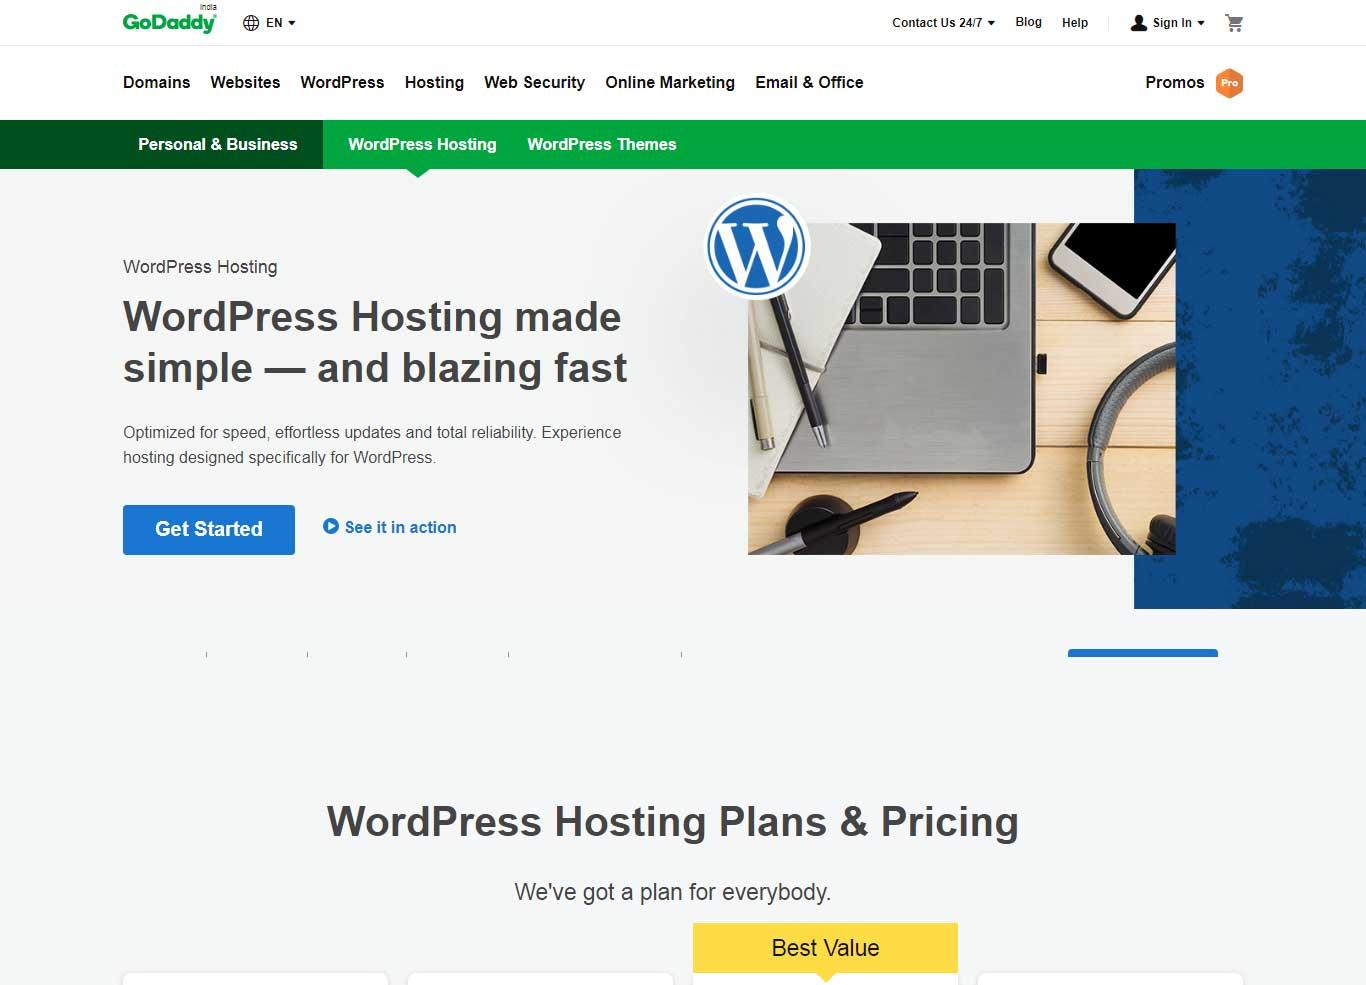 godaddy - How to set up Shopify with WordPress? (Step by step tutorial)